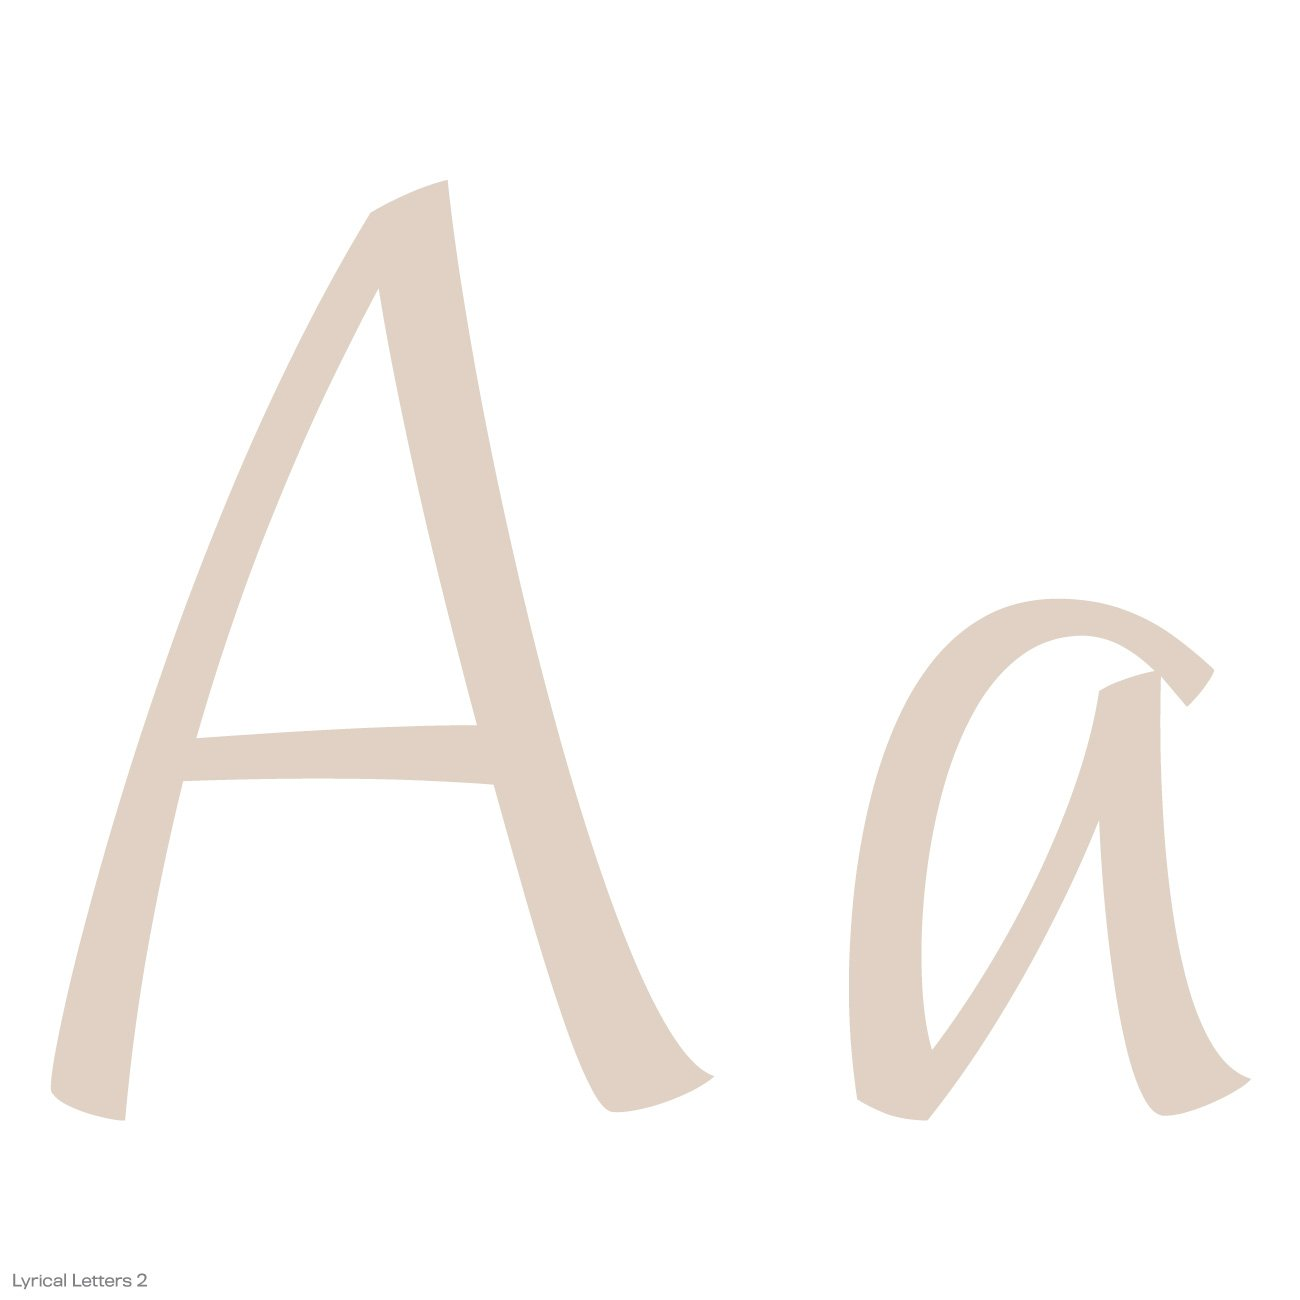 Cricut Lyrical Letters 2 Cartridge by Cricut (Image #24)